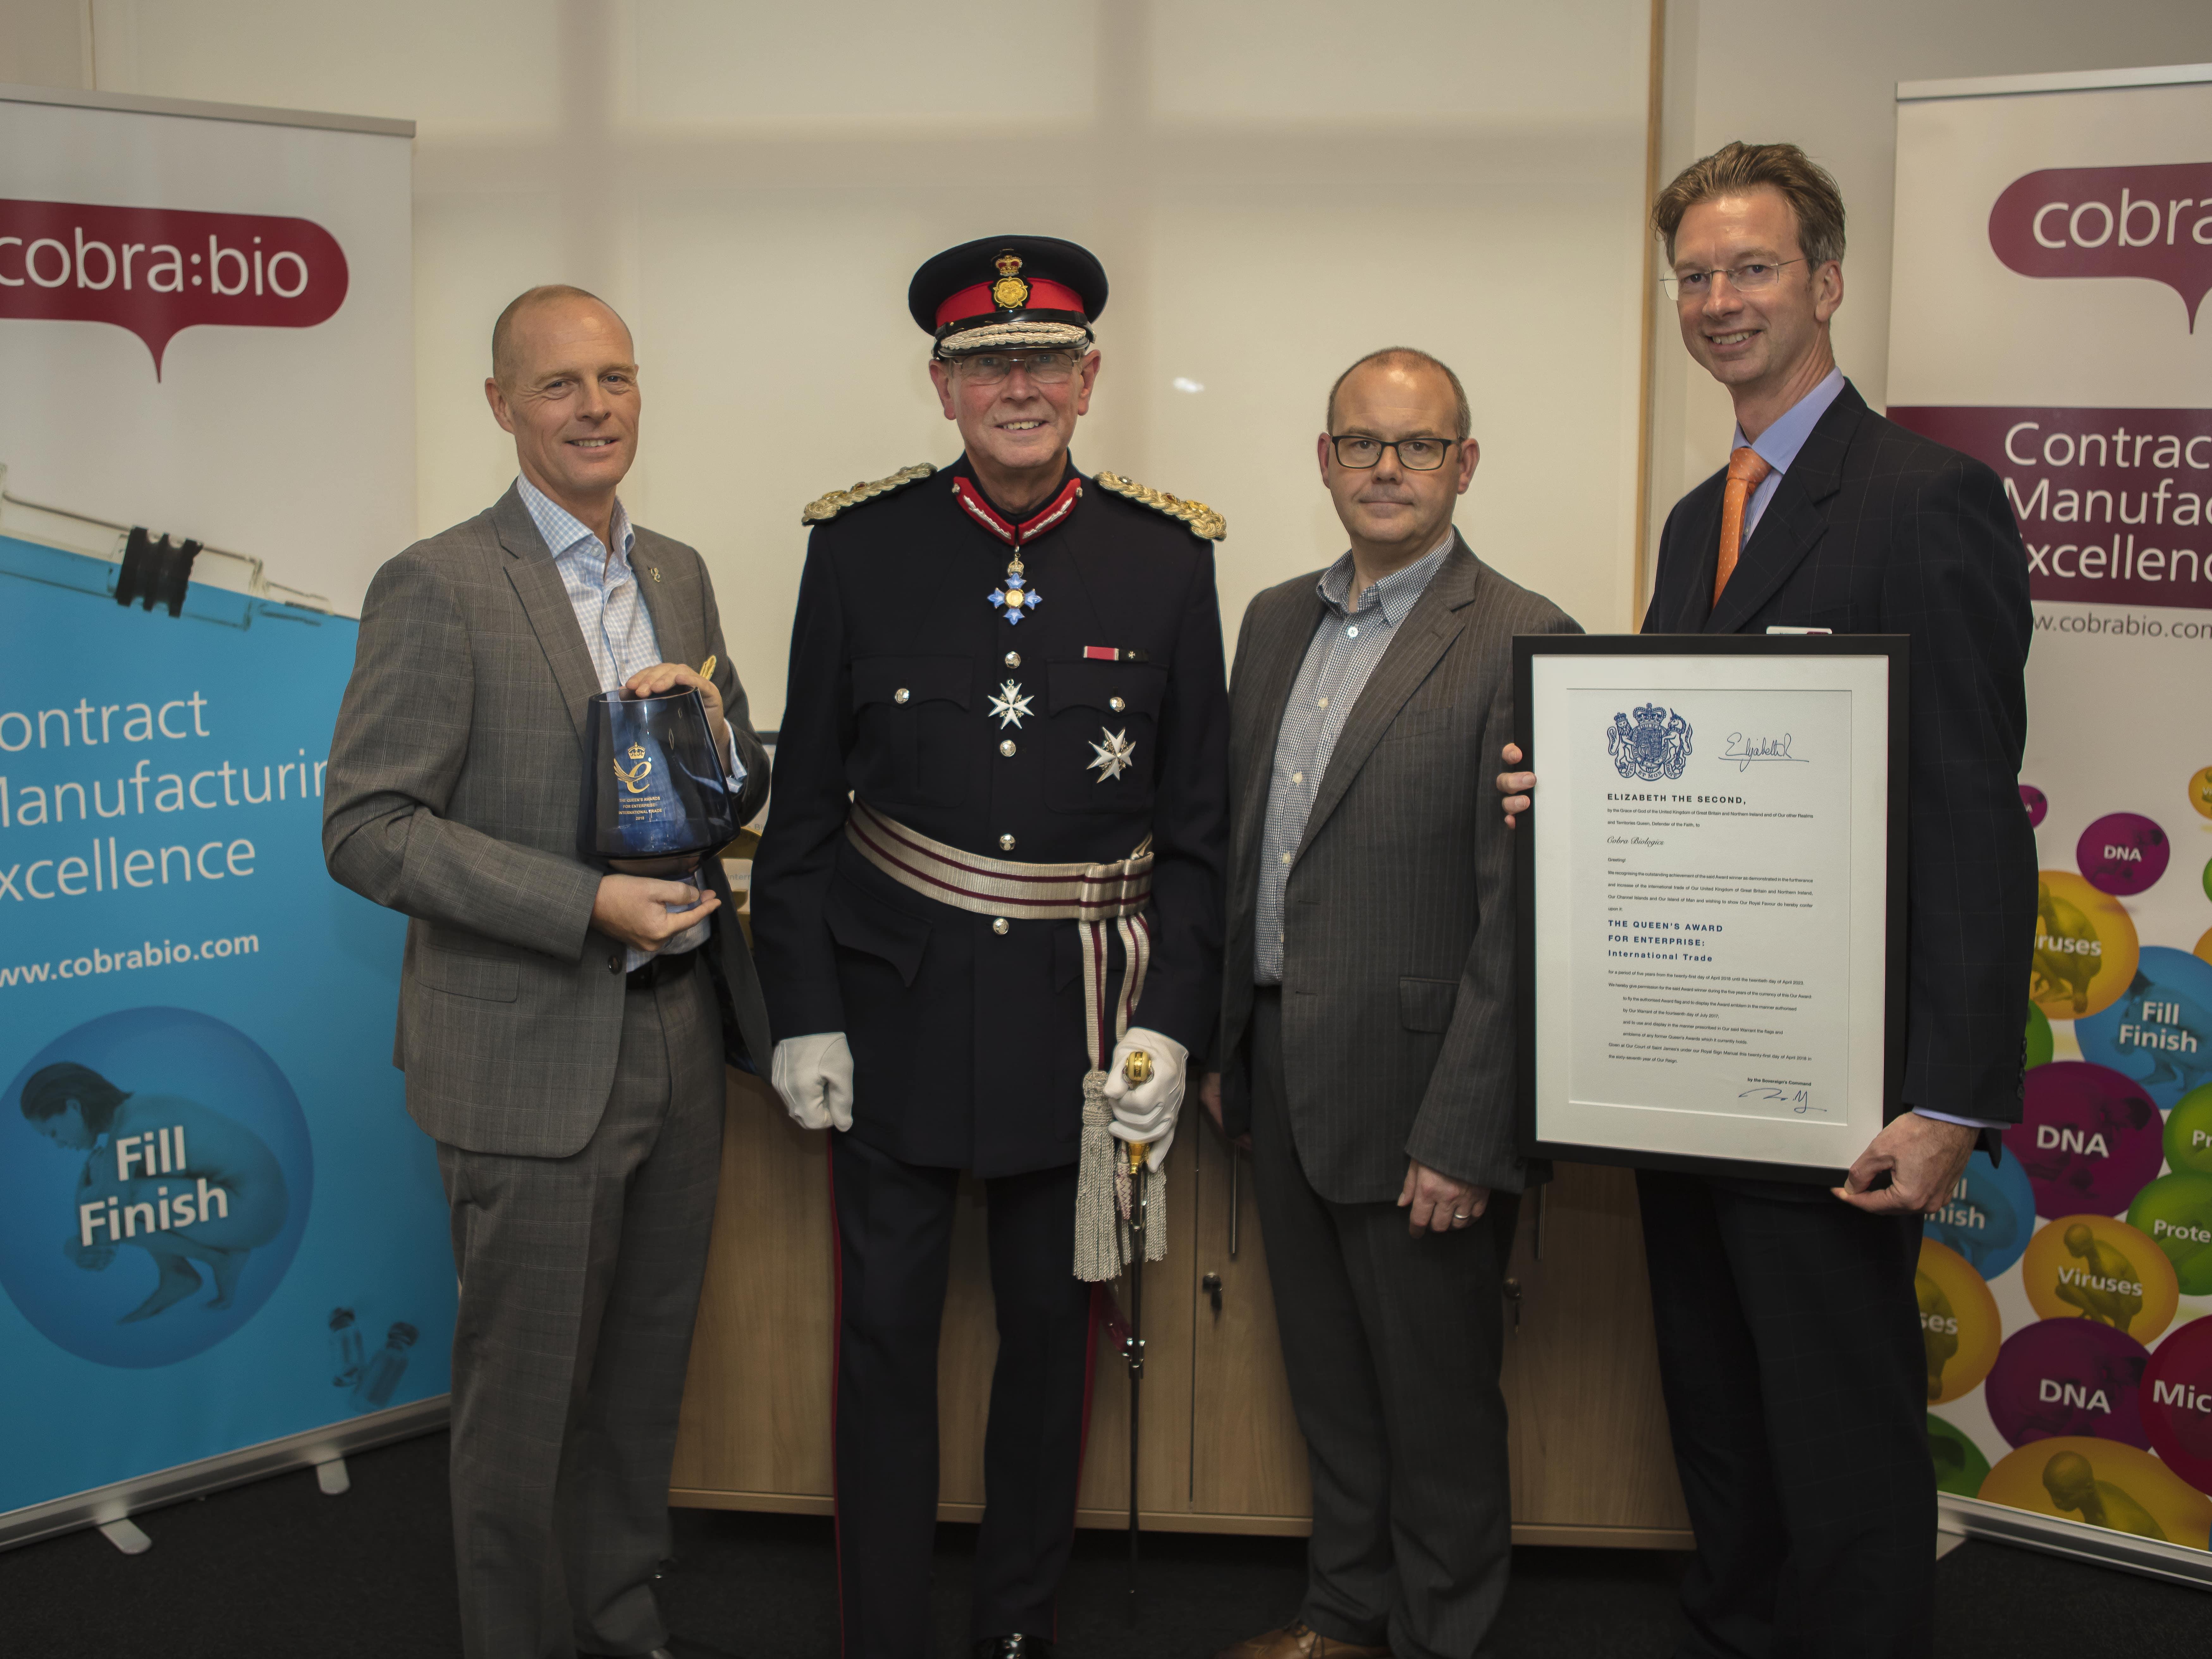 Cobra Biologics Celebrates the Queen's Award for Enterprise in International Trade